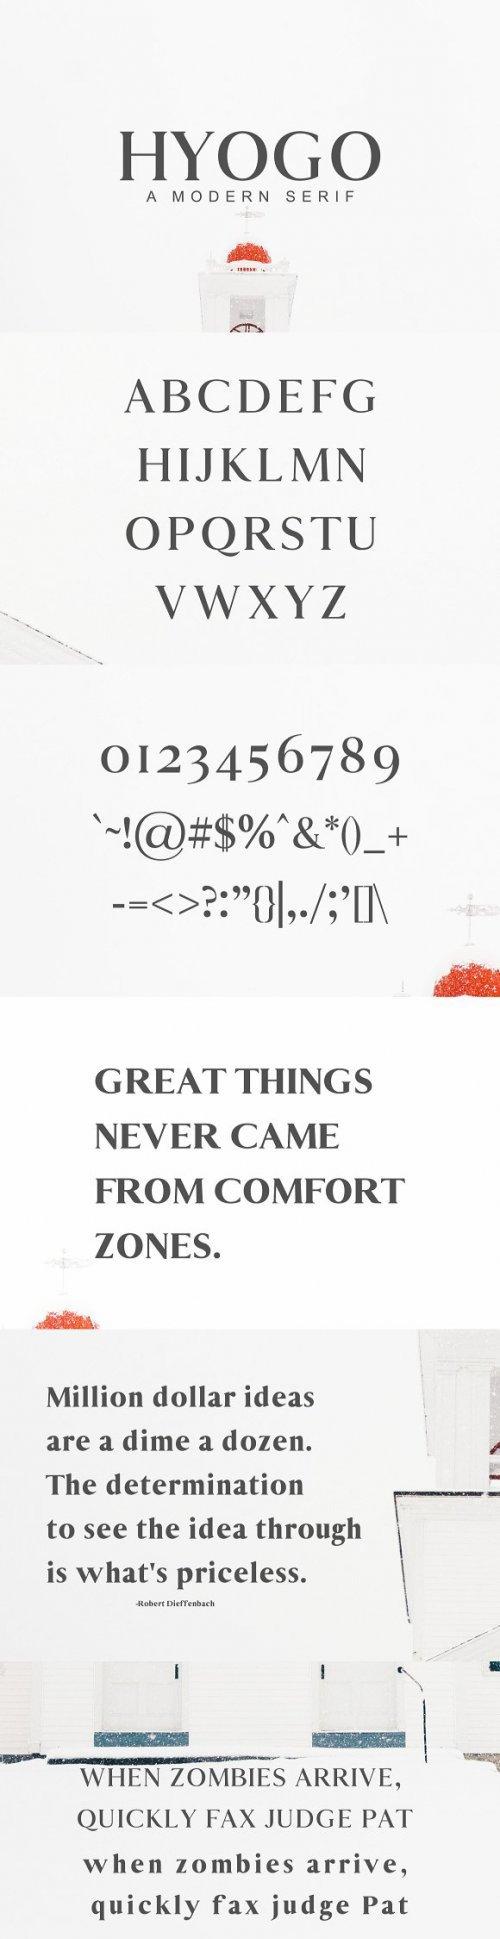 Hyogo A Modern Serif Font Family 3364019